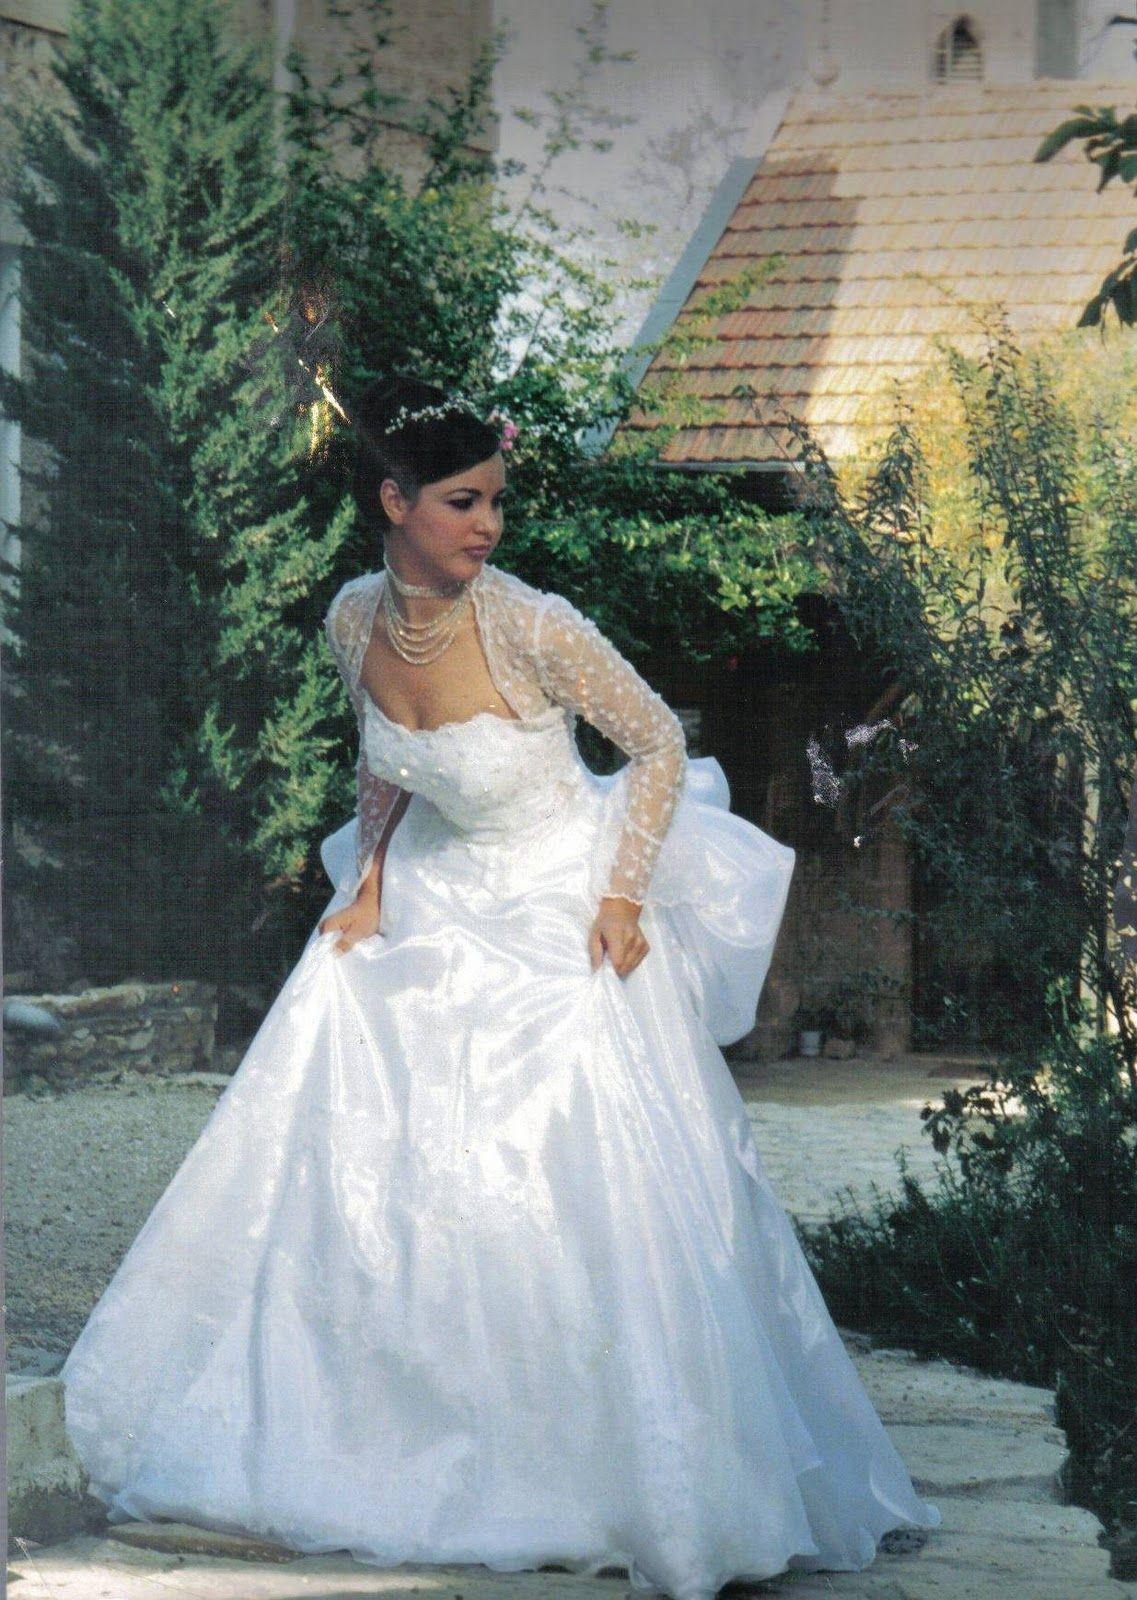 Christian Dior Wedding Dresses | ... Fashion With Sameramese: Samerameseu0027s Wedding  Dress Inspired